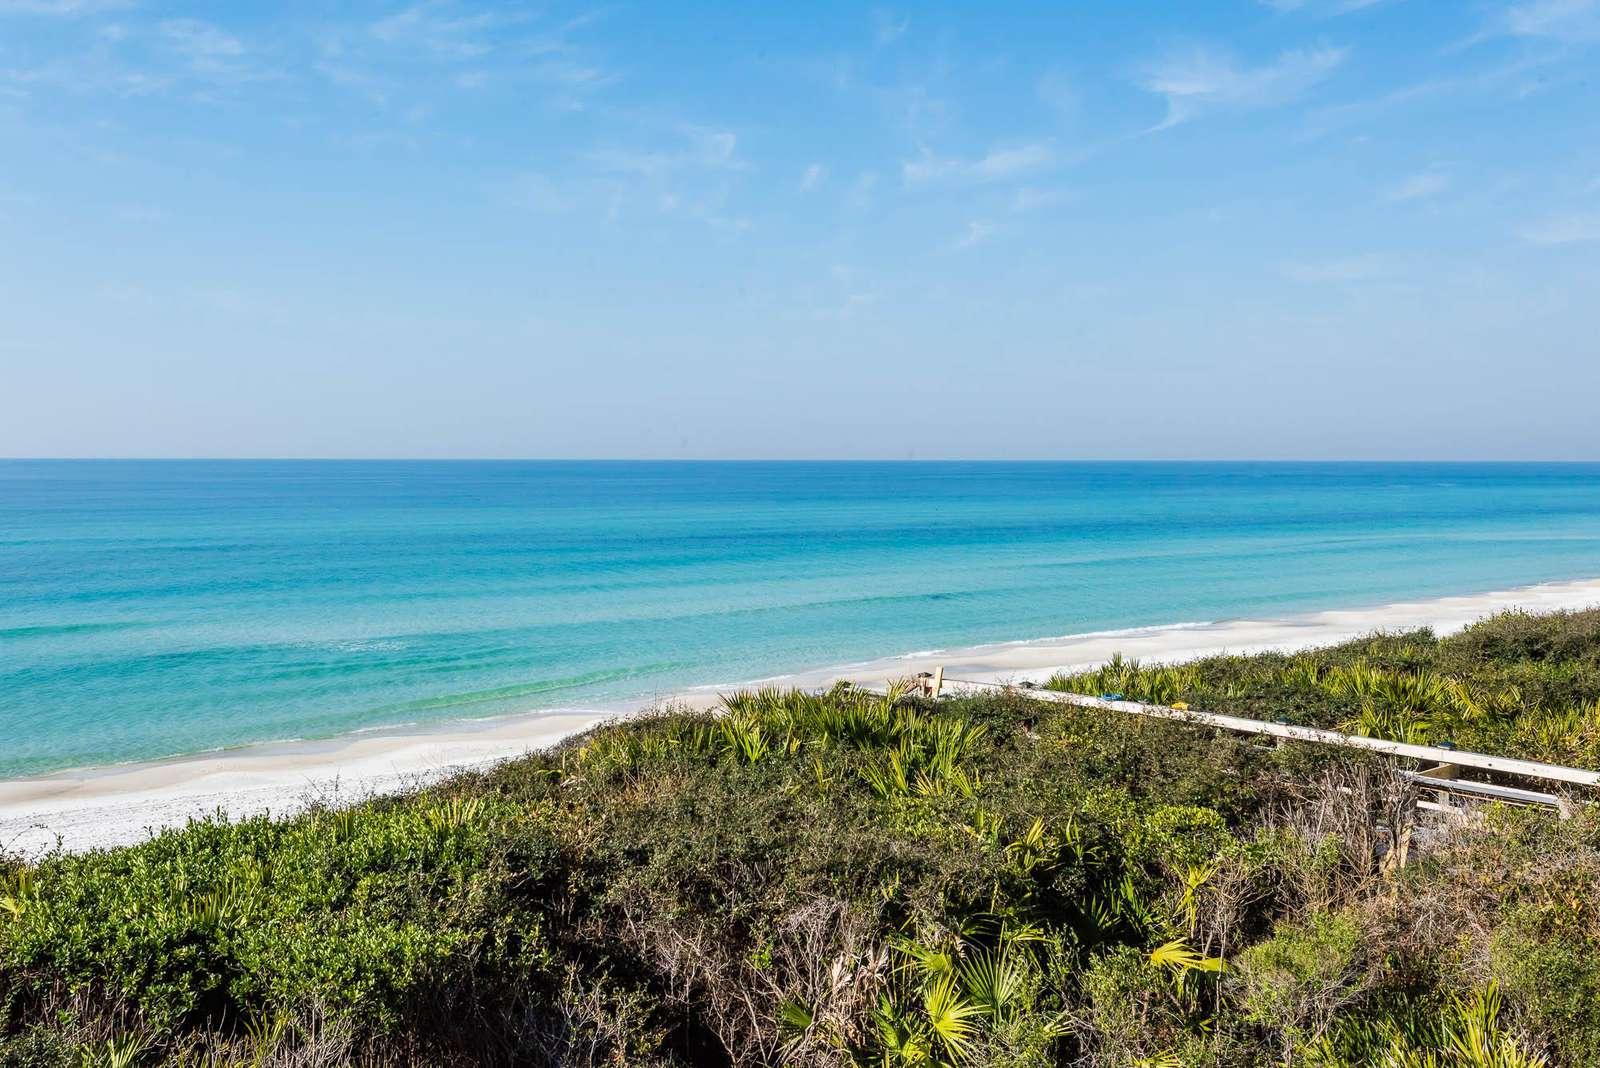 Seacrest Private Beach Access